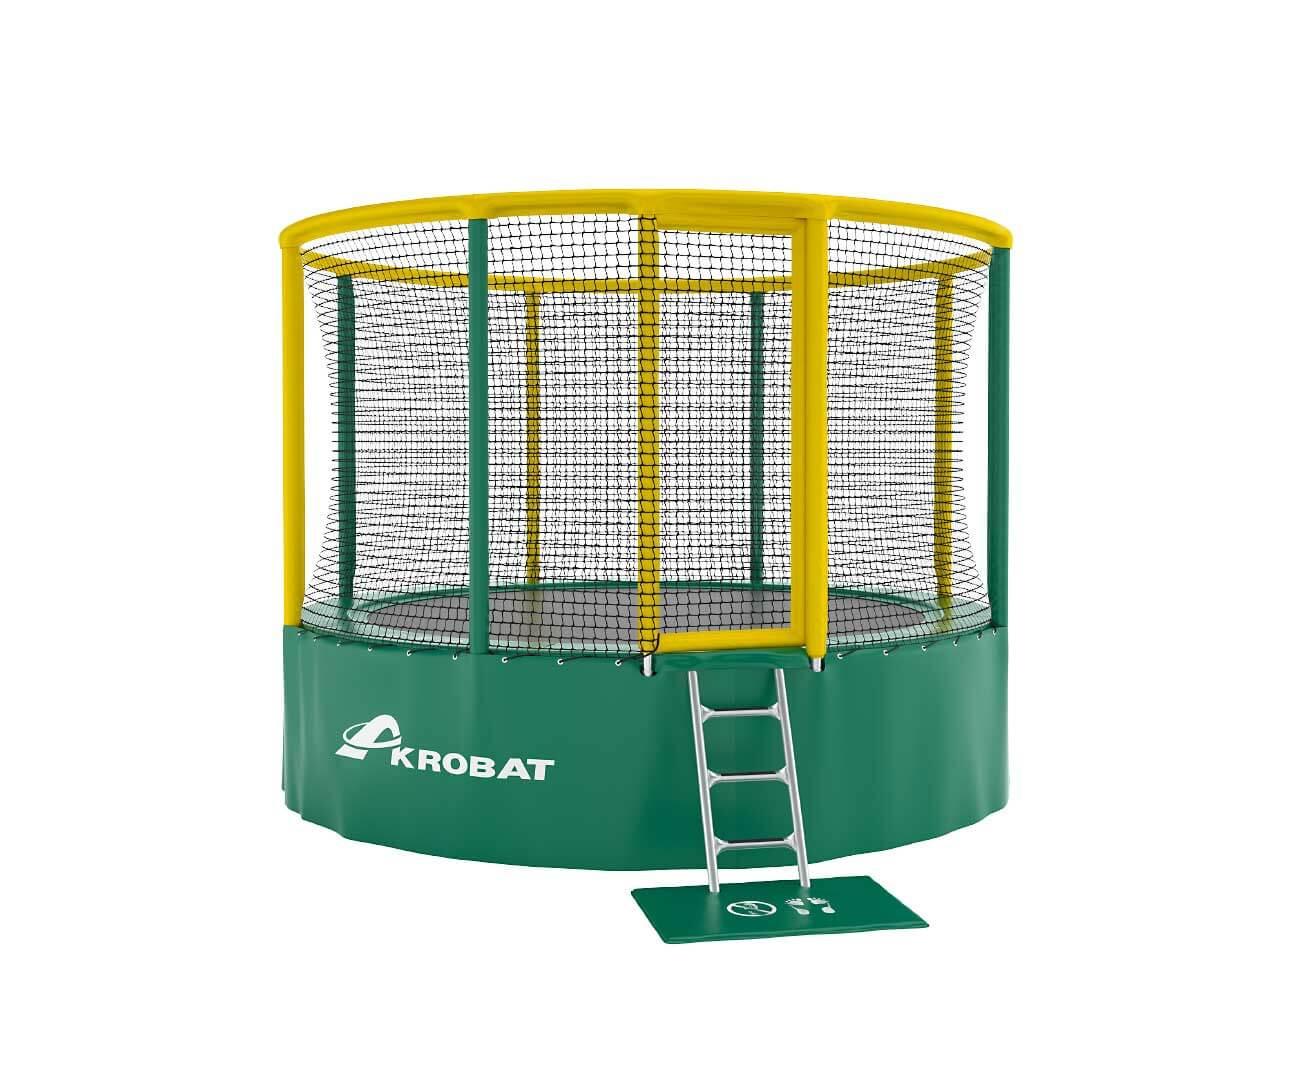 Akrobat Gallus 480 Green-yellow enclosure / Green safety pad /Black jumping mat